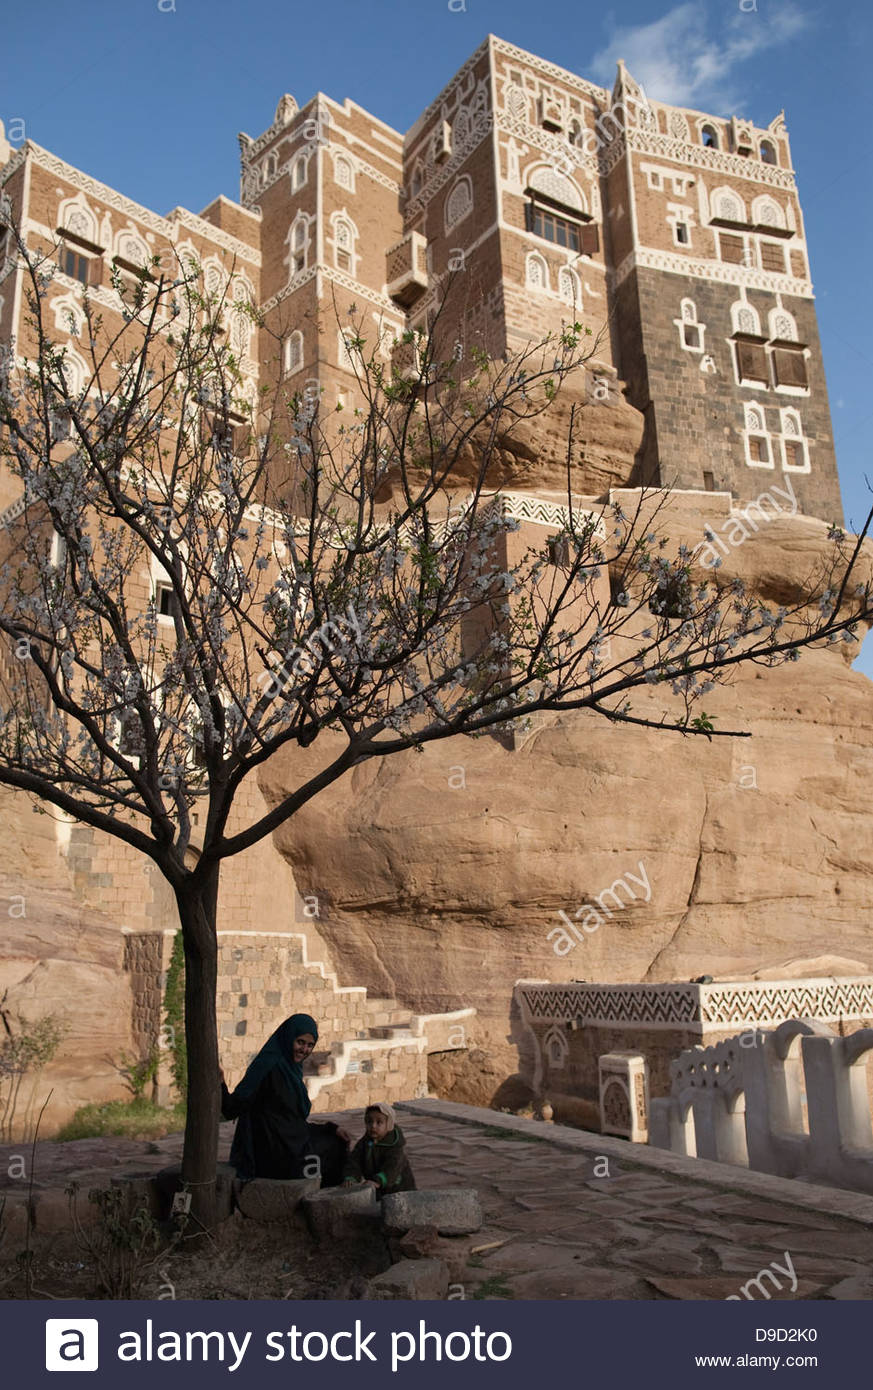 Woman sitting near a tree with a palace in the background, Dar Al-Hajar, Wadi Dhar, Sana'a, Yemen - Stock Image